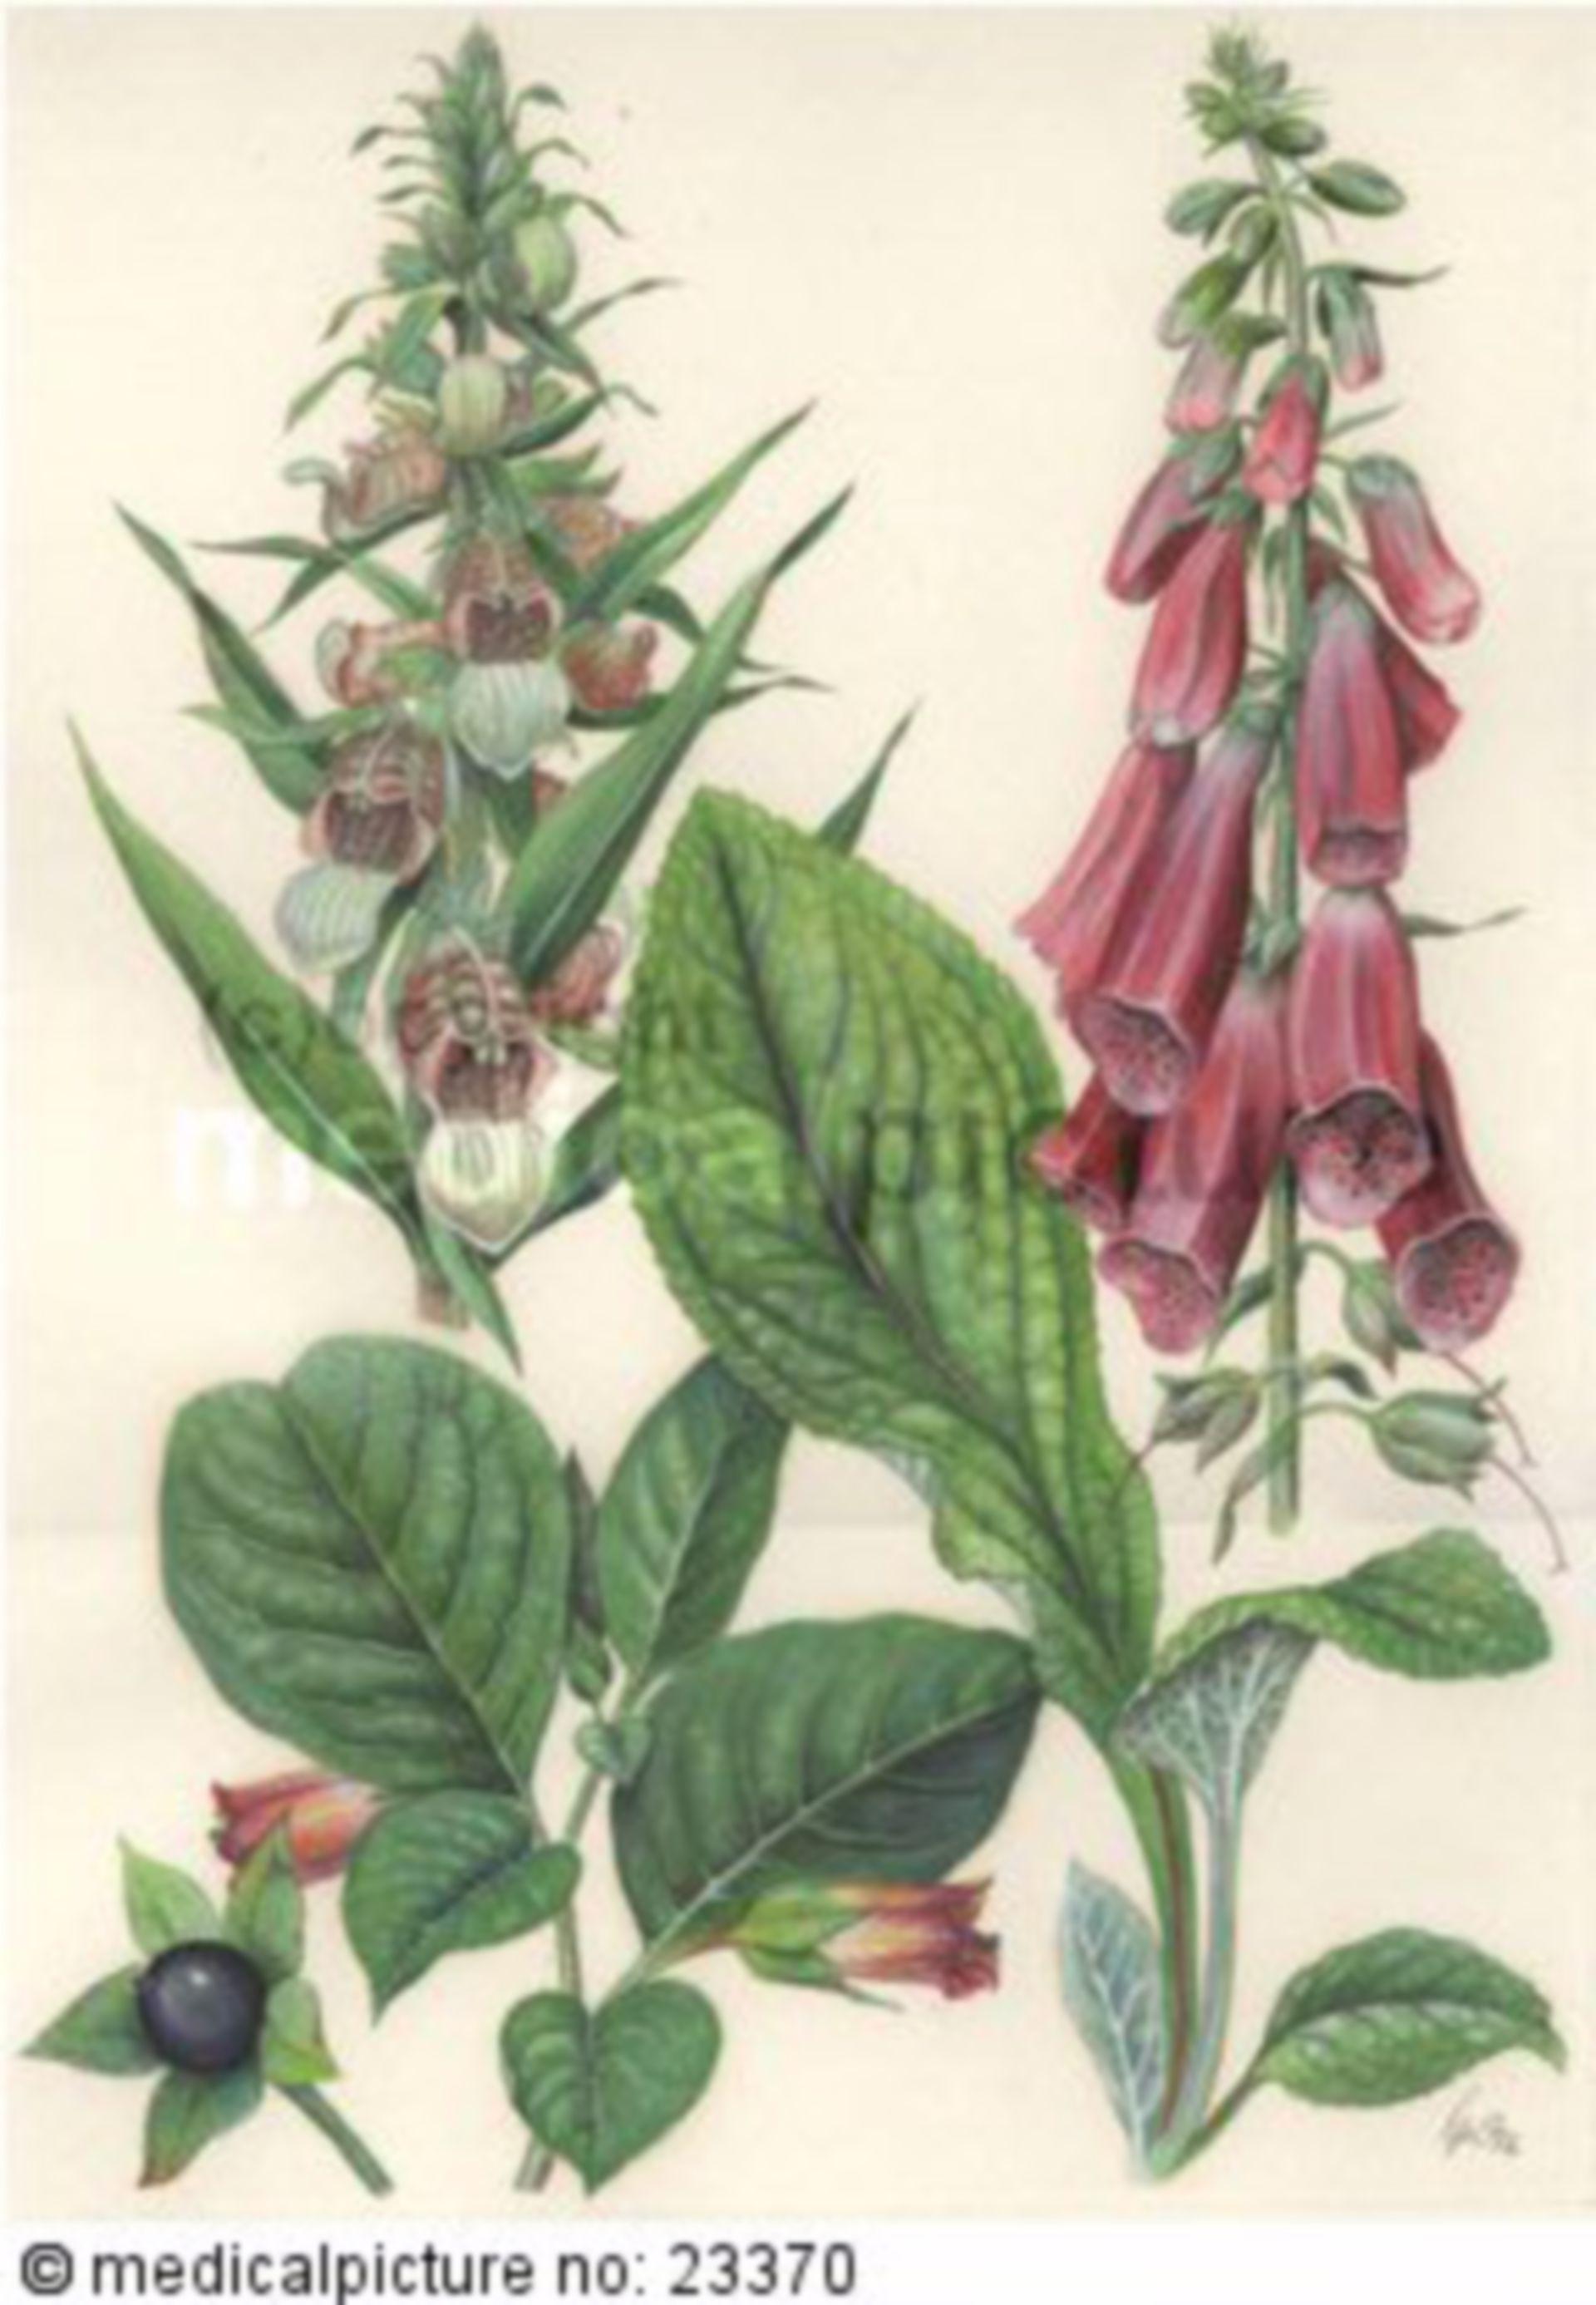 Foxglove and belladonna